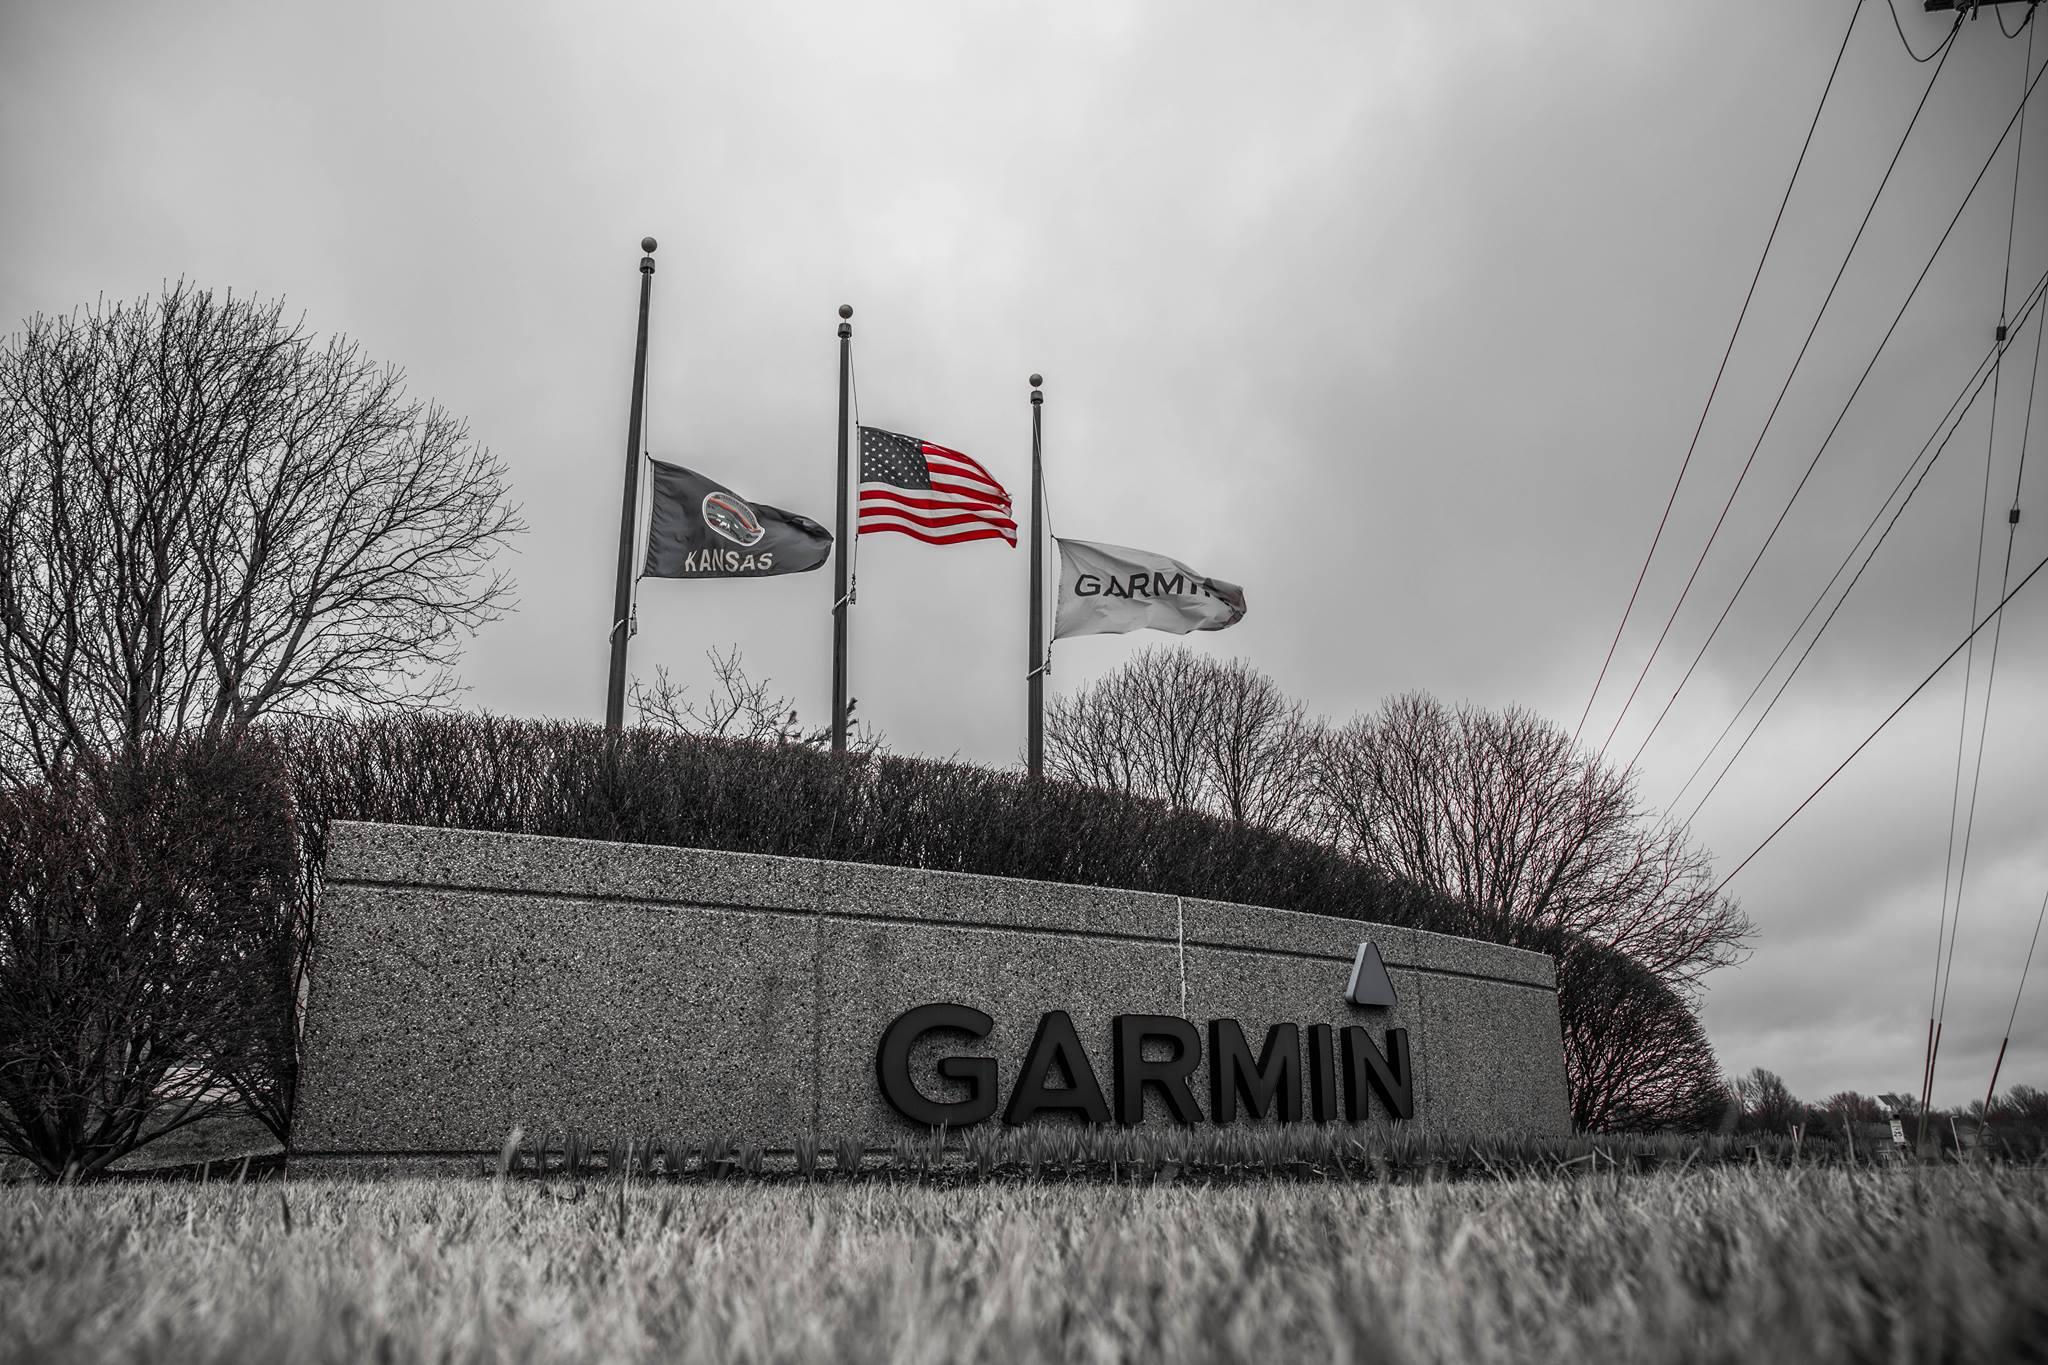 Garmin Engineer